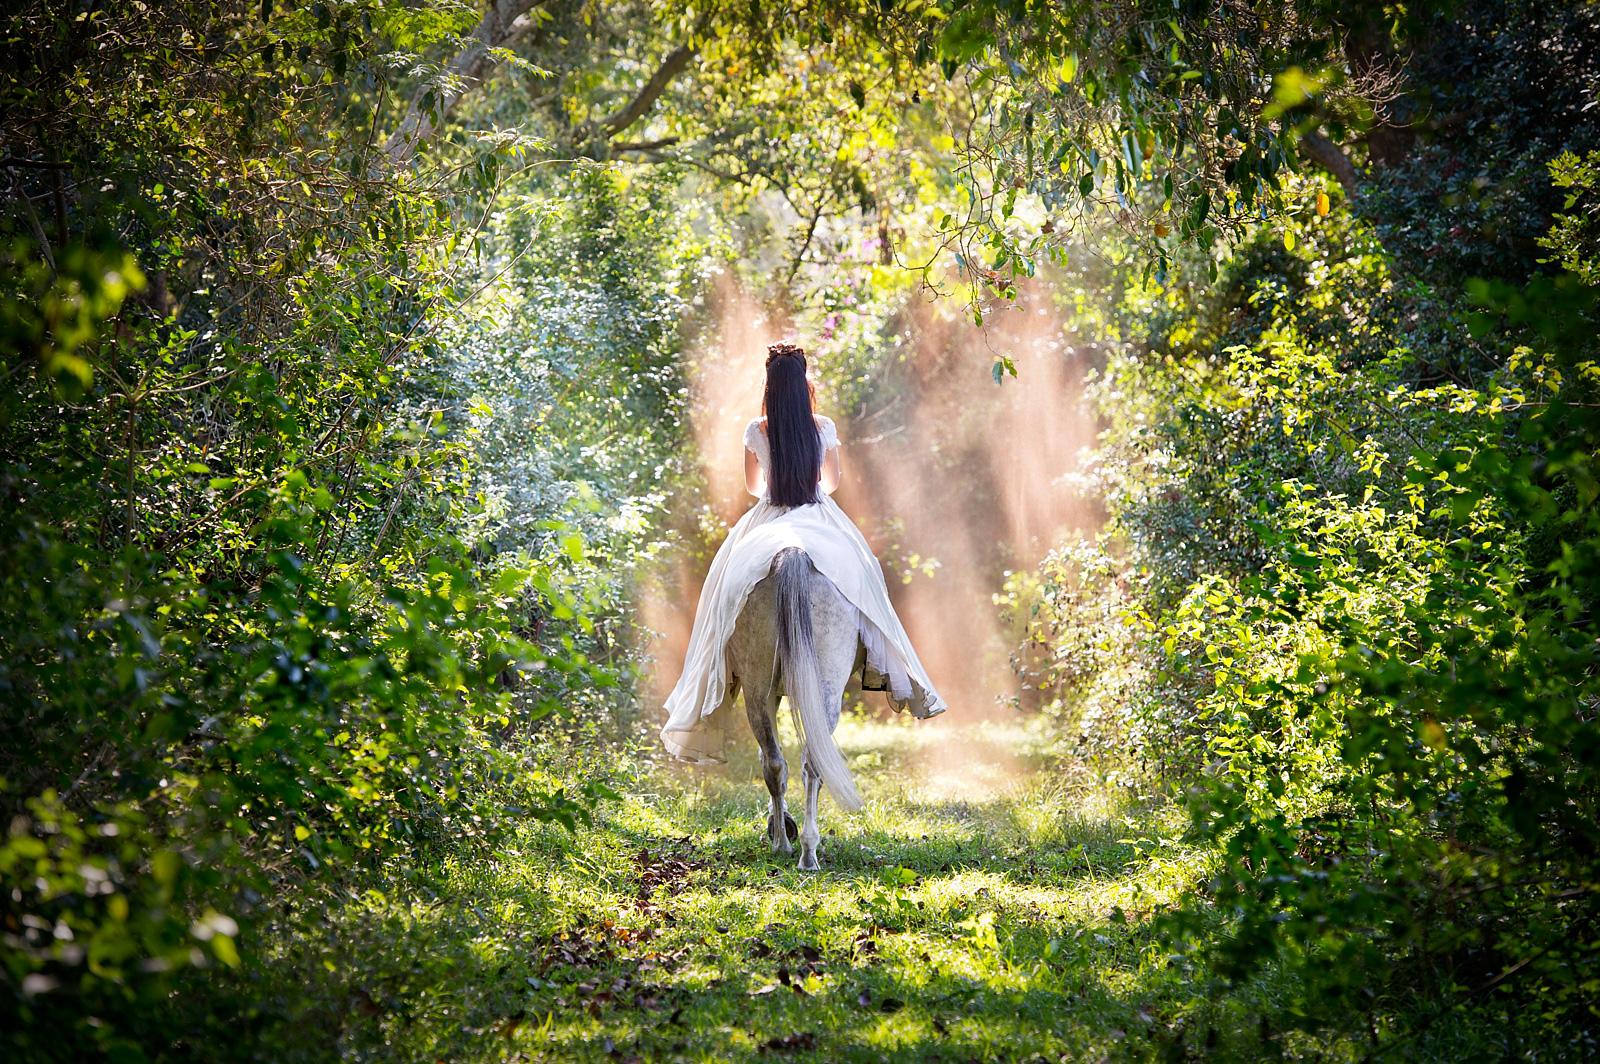 Girl riding away on a horse